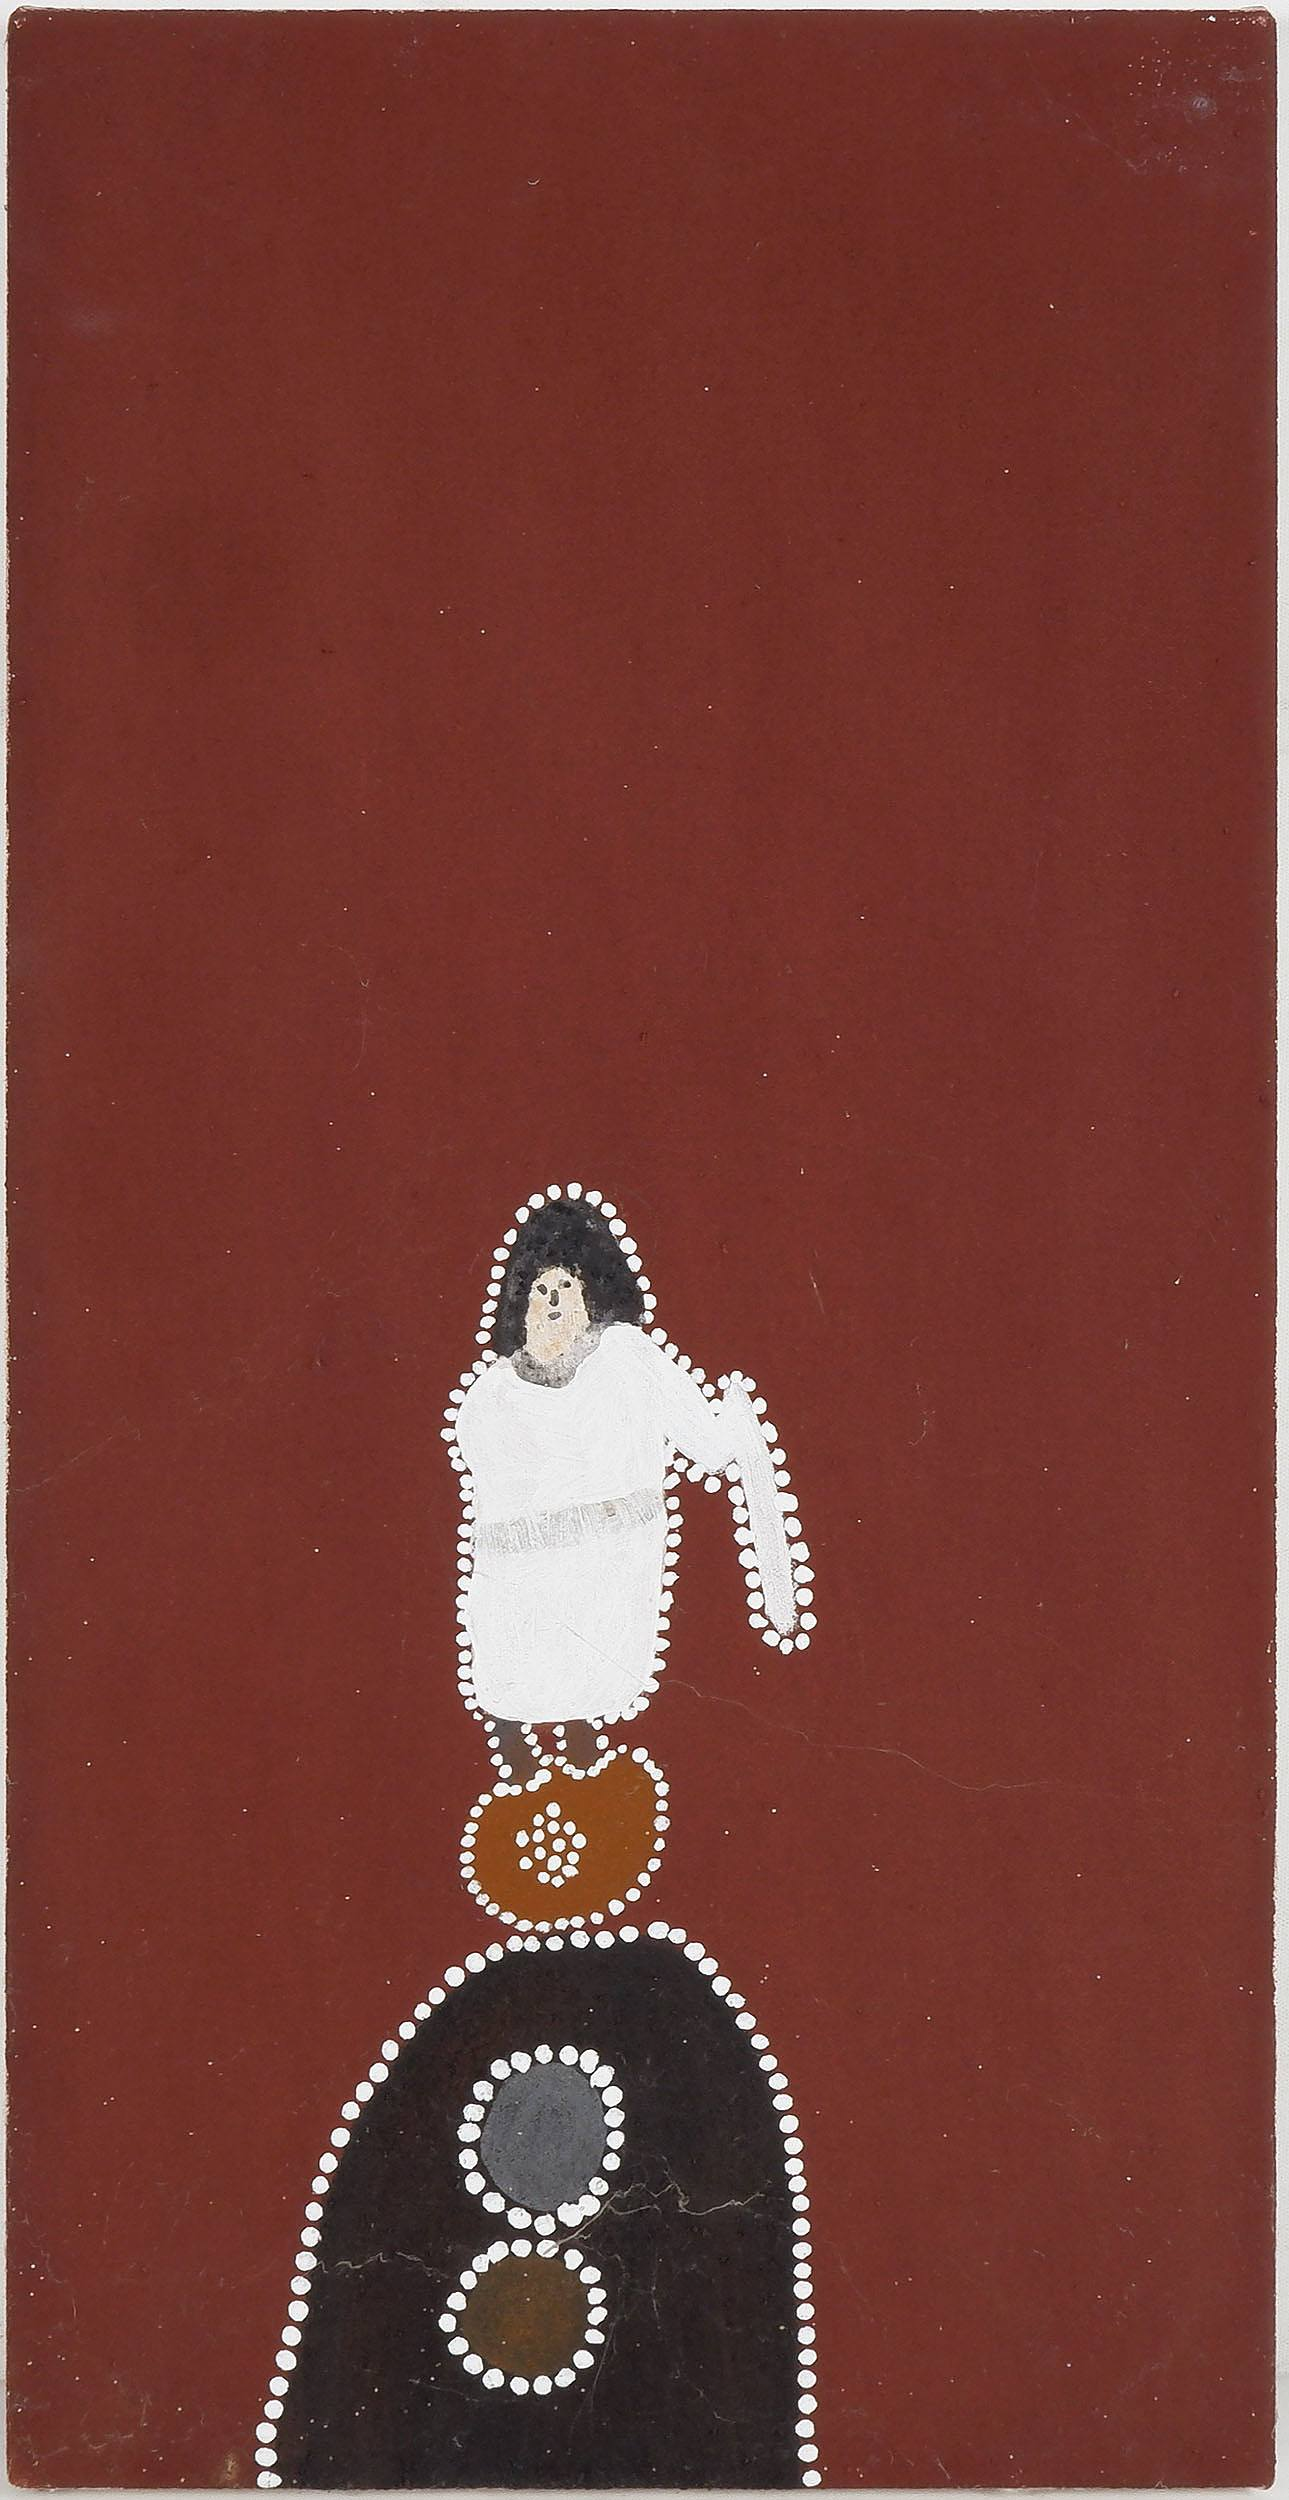 'Mabel Juli (c.1933-) Marranyji and Jiyirriny, Ochre on Canvas'